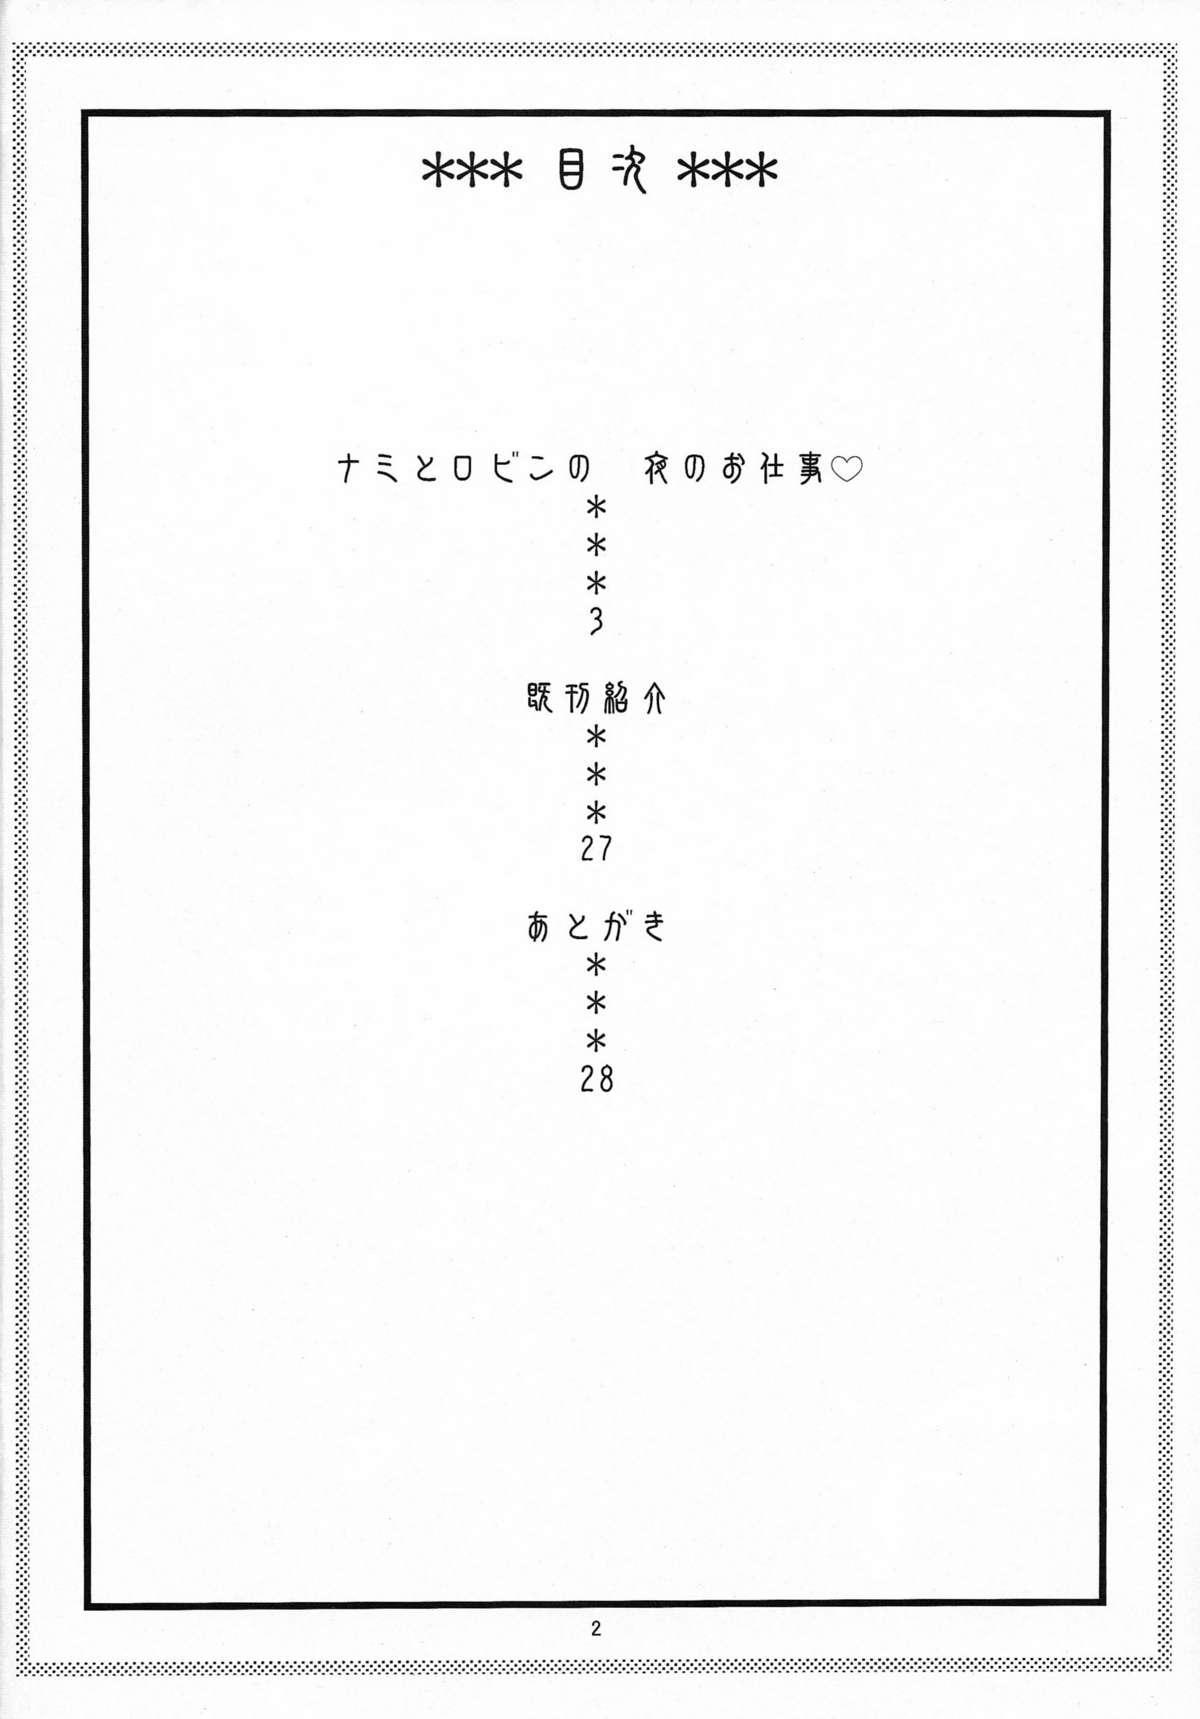 NamiRobi 5 2